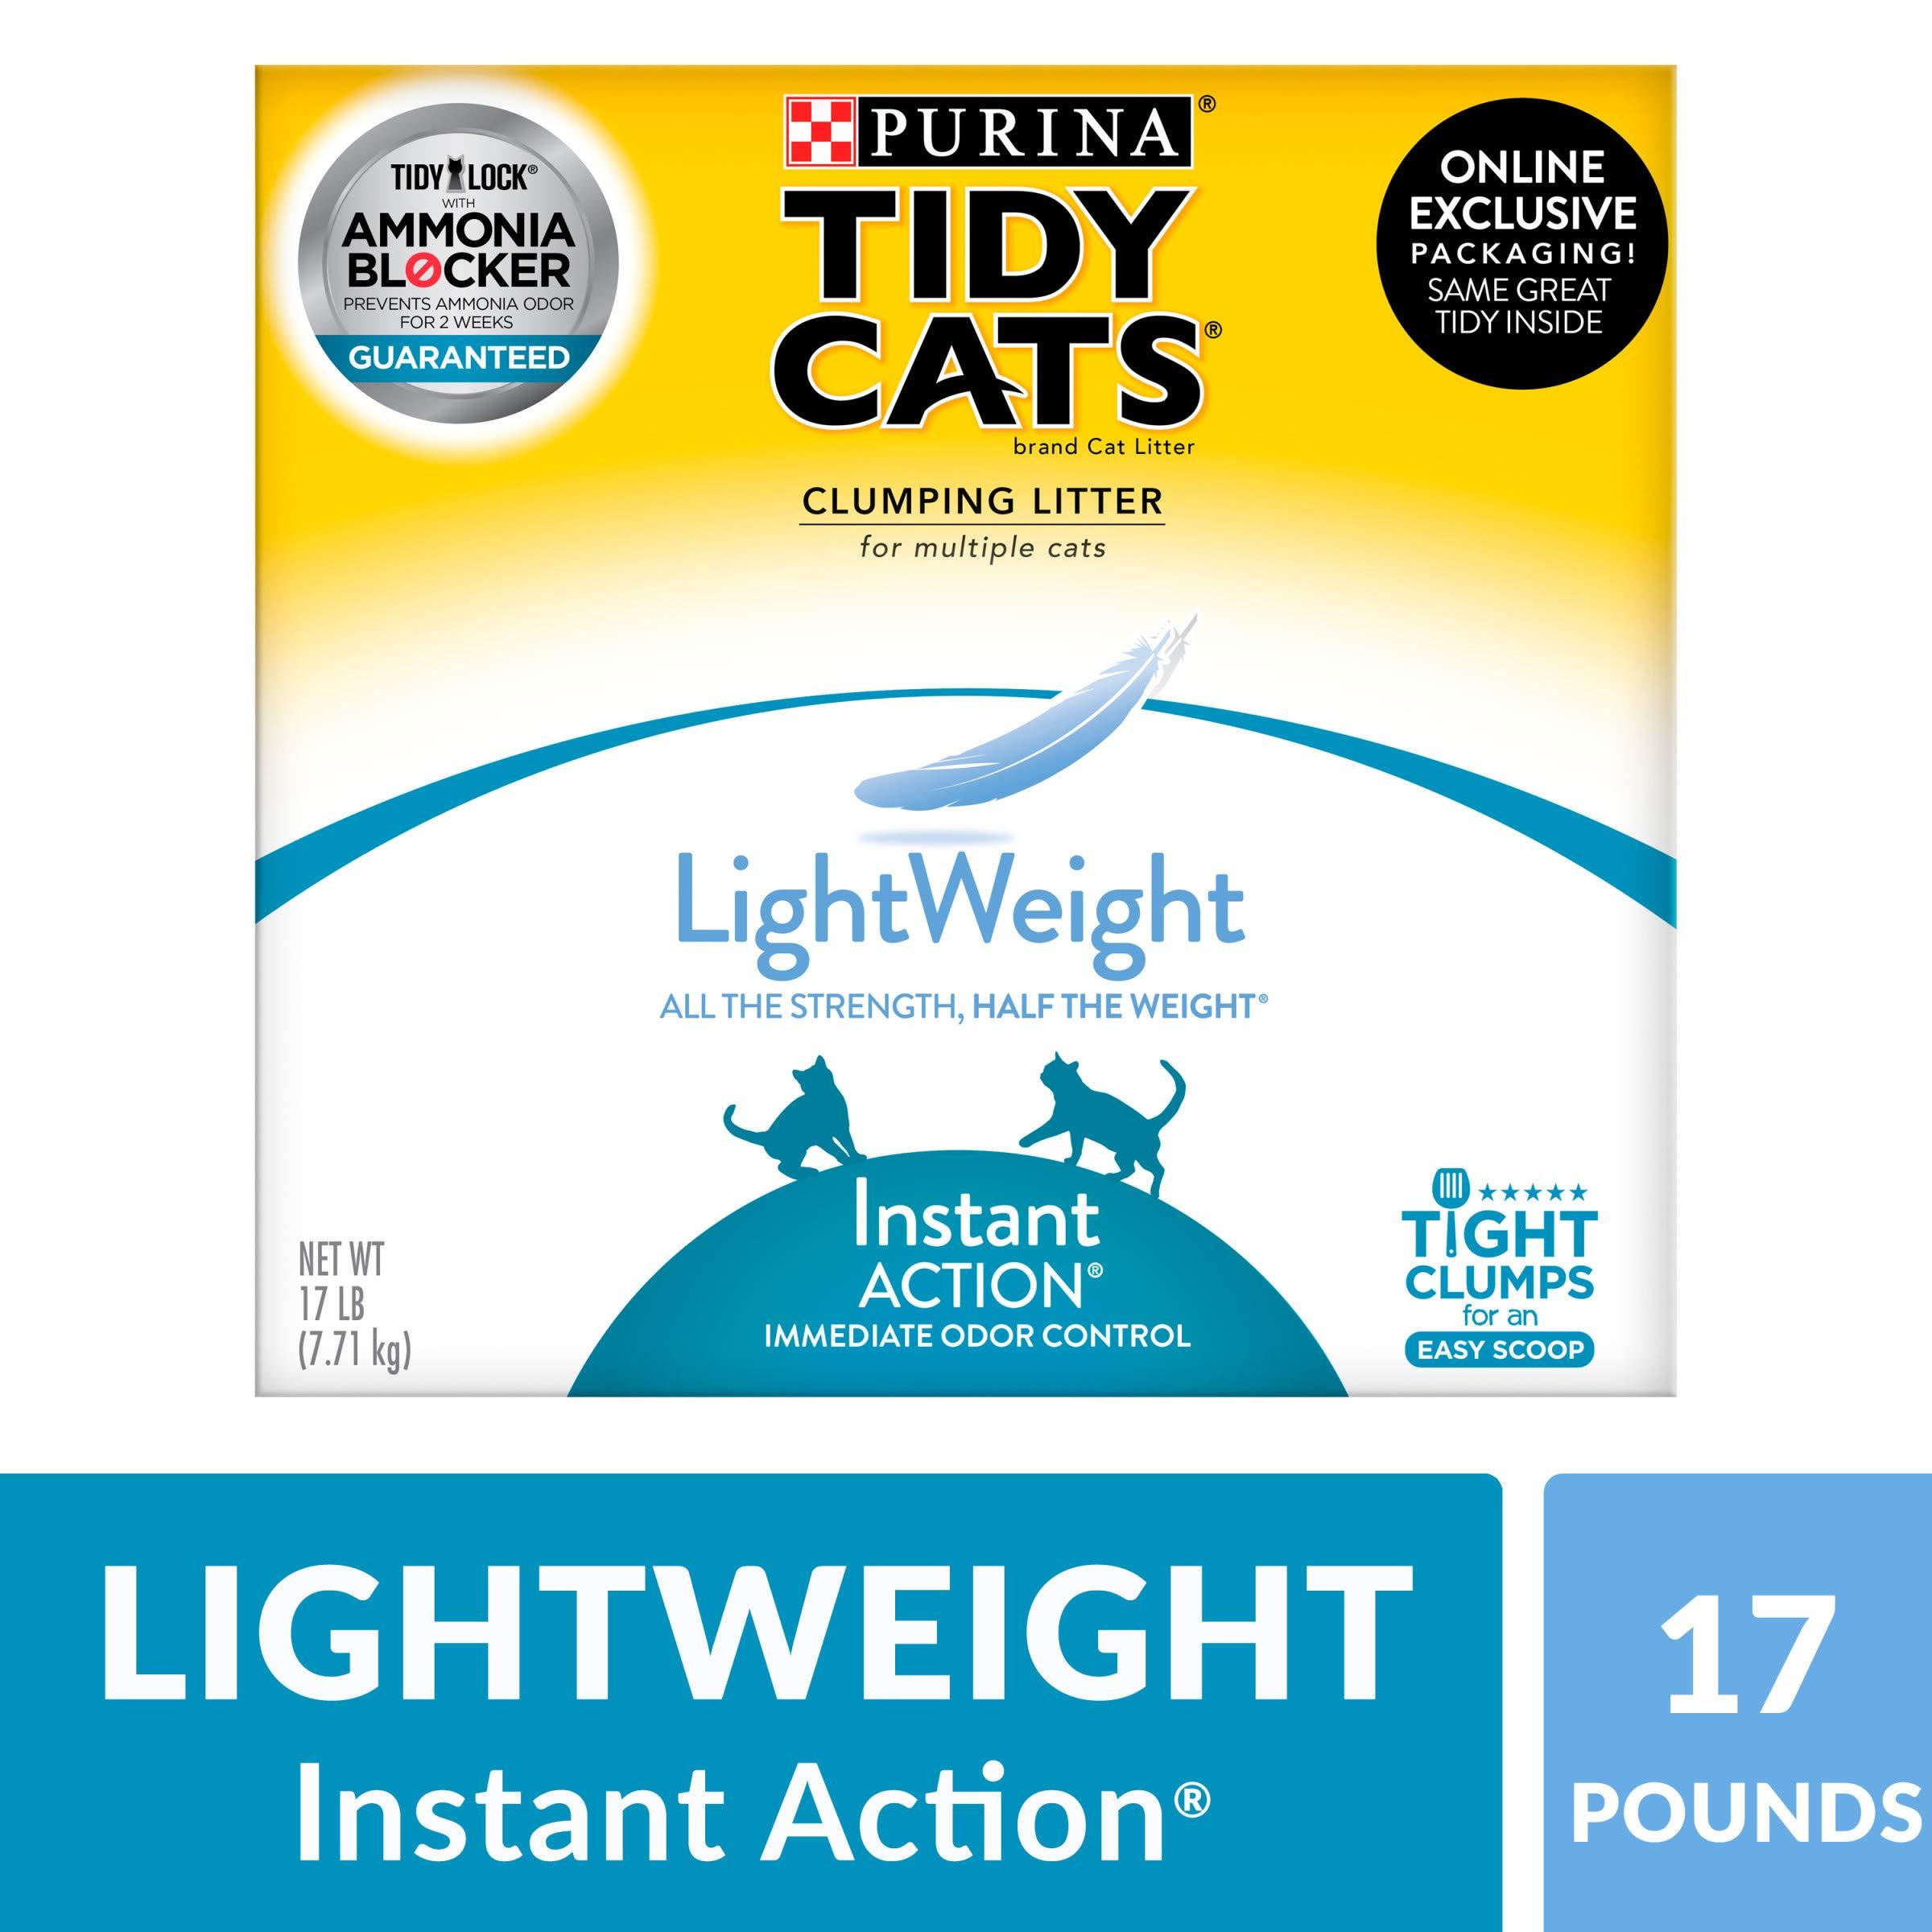 Purina Tidy Cats Light Weight, Dust Free, Clumping Cat Litter, LightWeight Instant Action Multi Cat Litter - 17 lb. Box